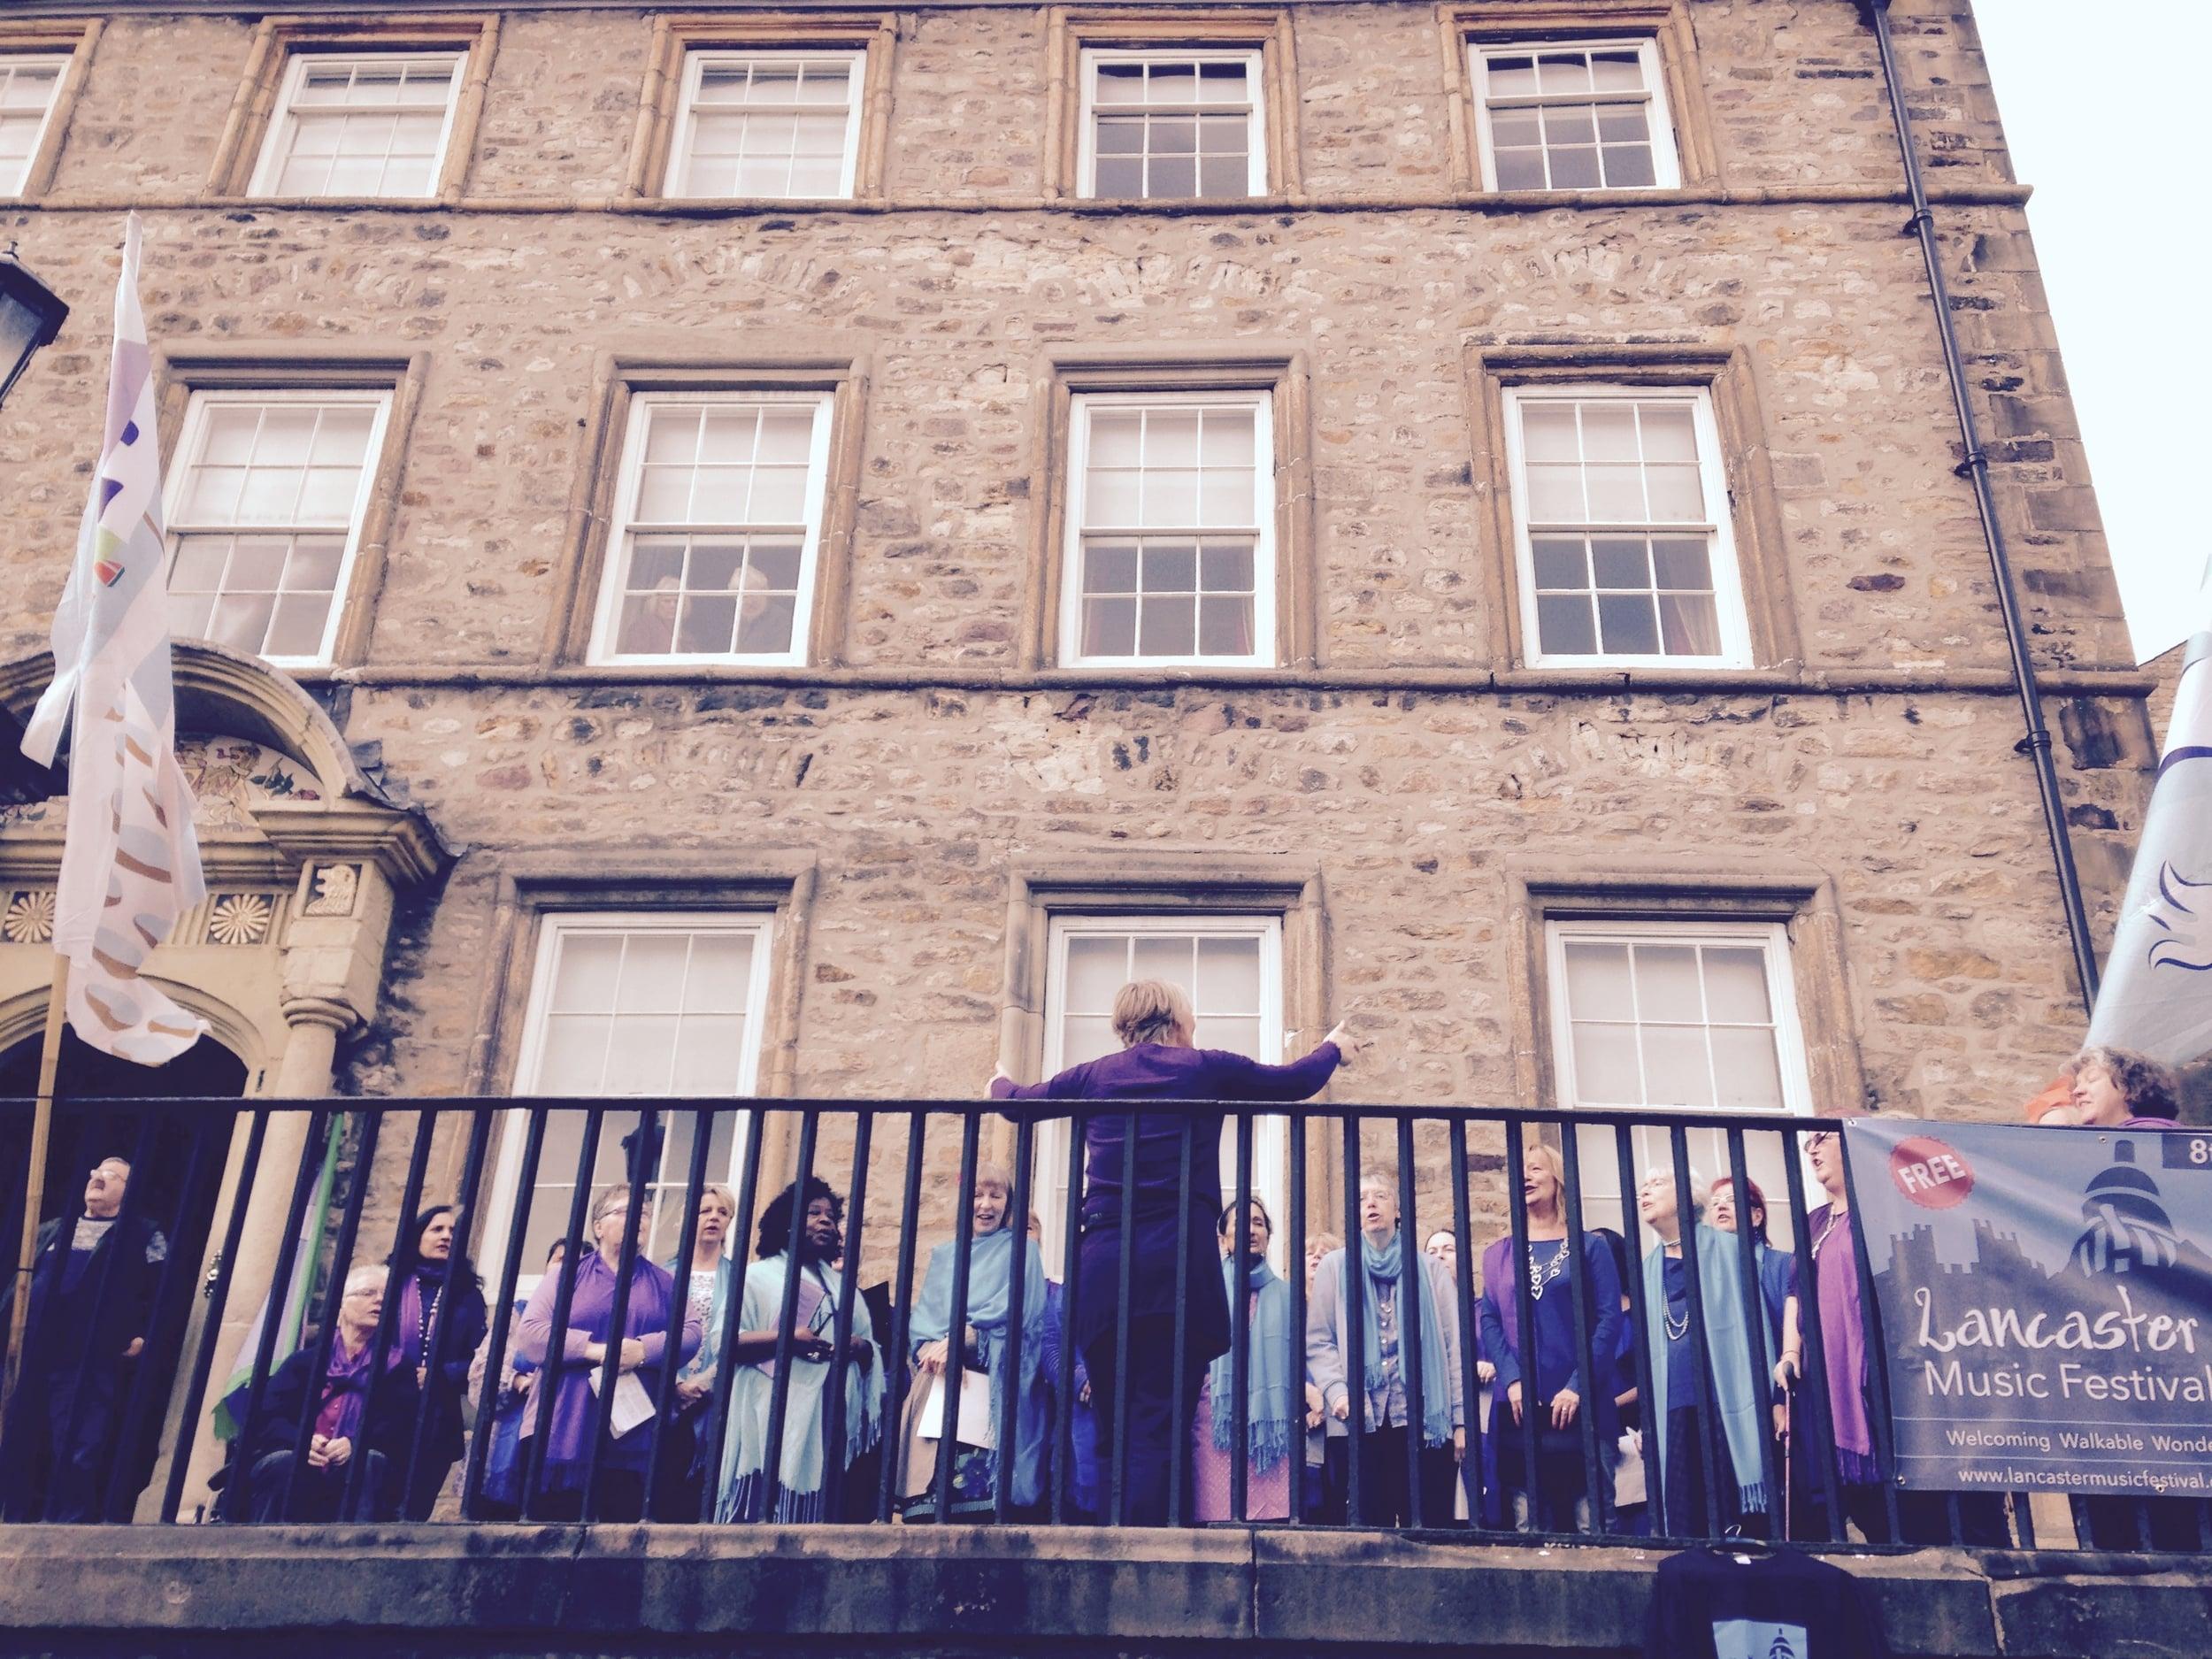 Sacred Sounds Women's Choir perform at Lancaster Music Festival.Photo: Mark McCabe.